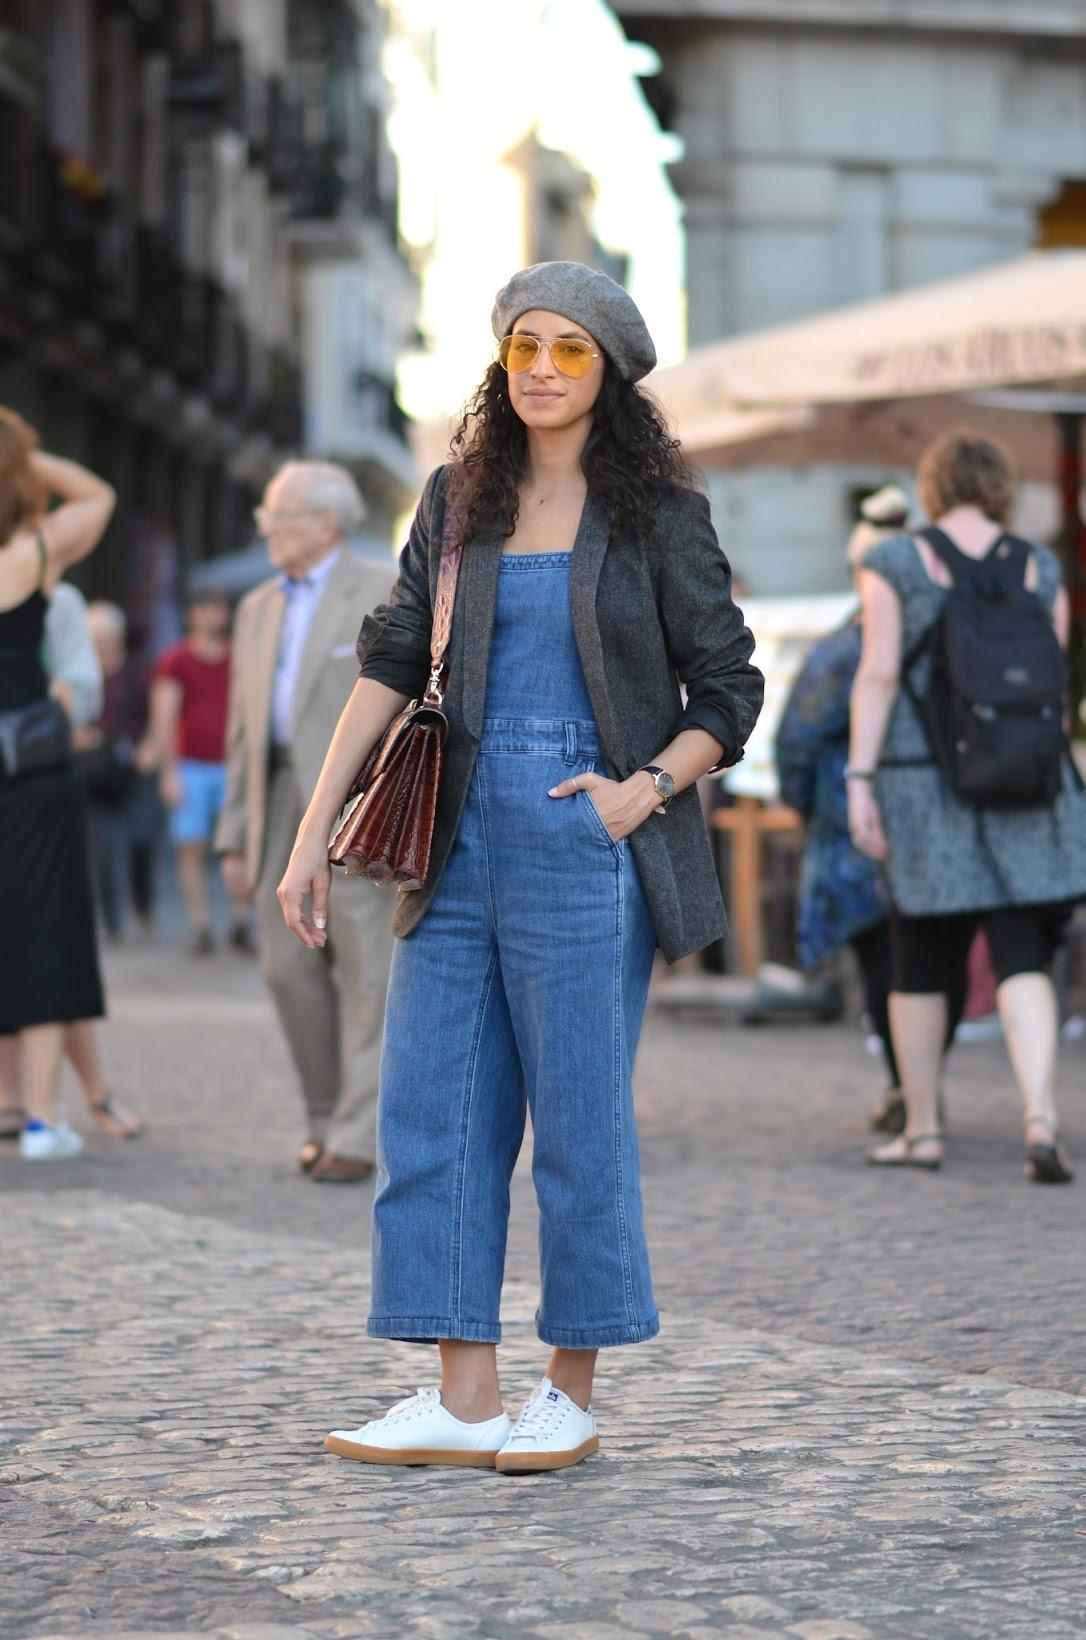 madrid street style, overalls, madewell overalls, blazer, yellow aviator glasses, beret